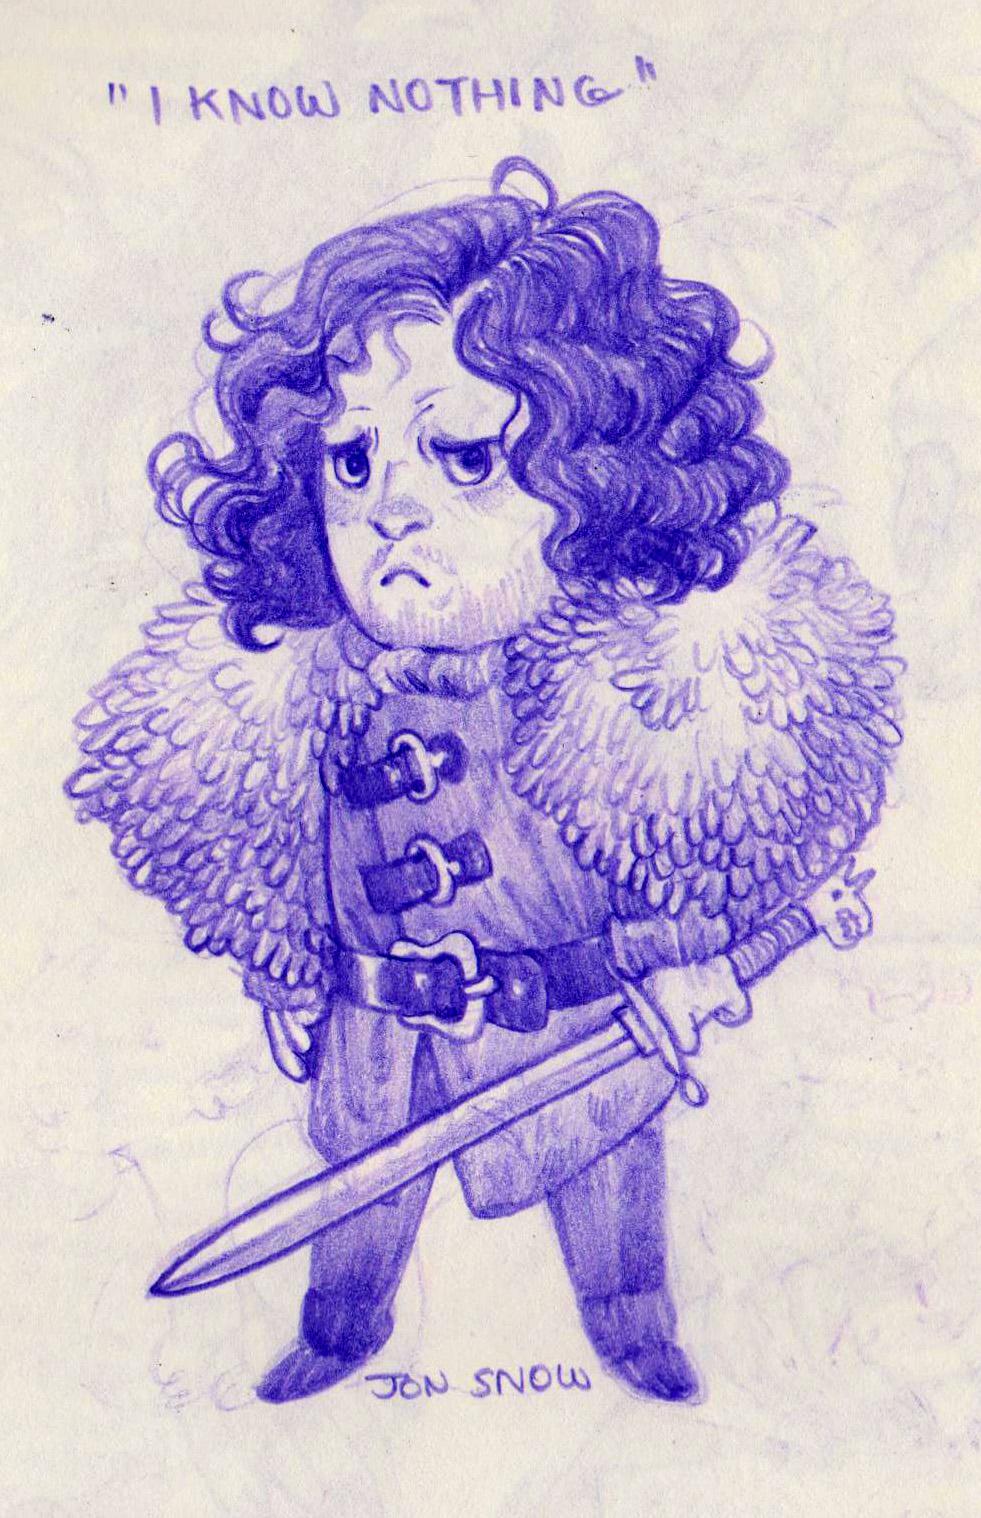 Jon Snow Cyn Saga